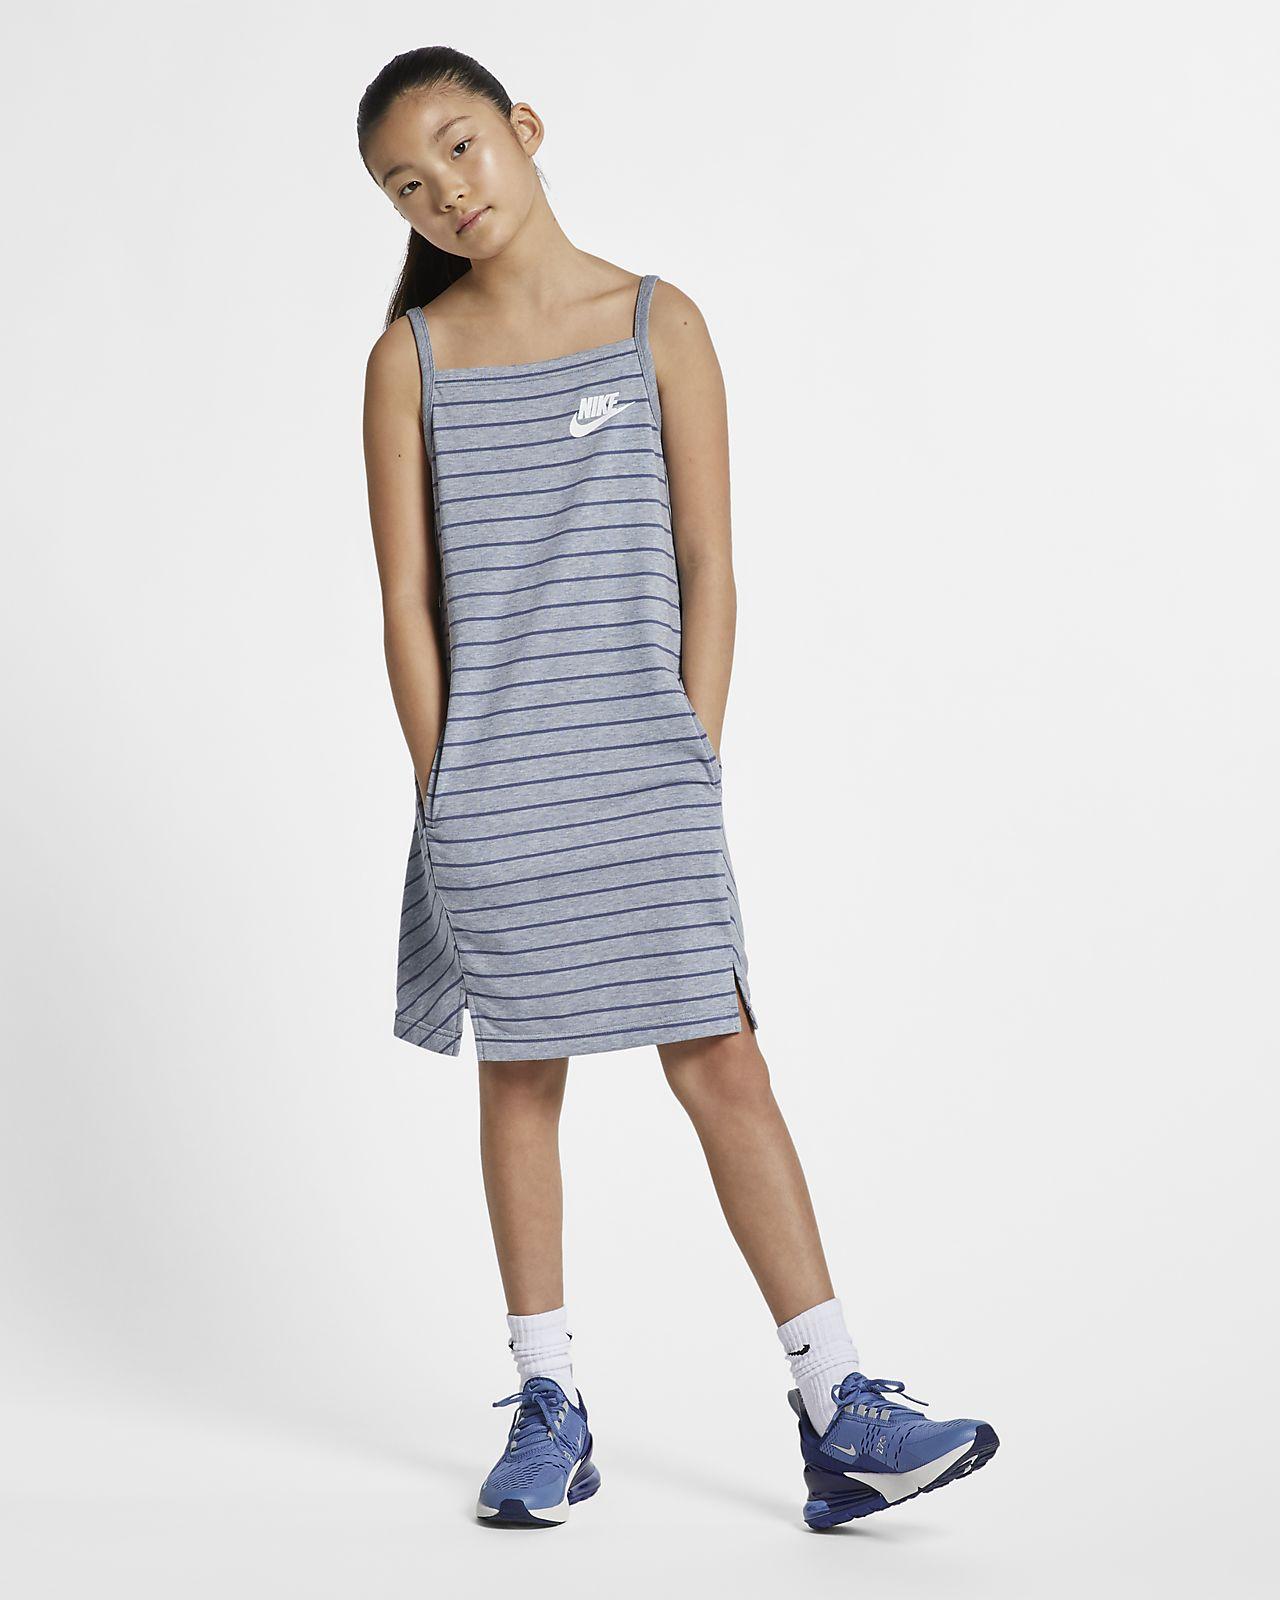 Vestido Nike Sportswear Júnior (Rapariga)